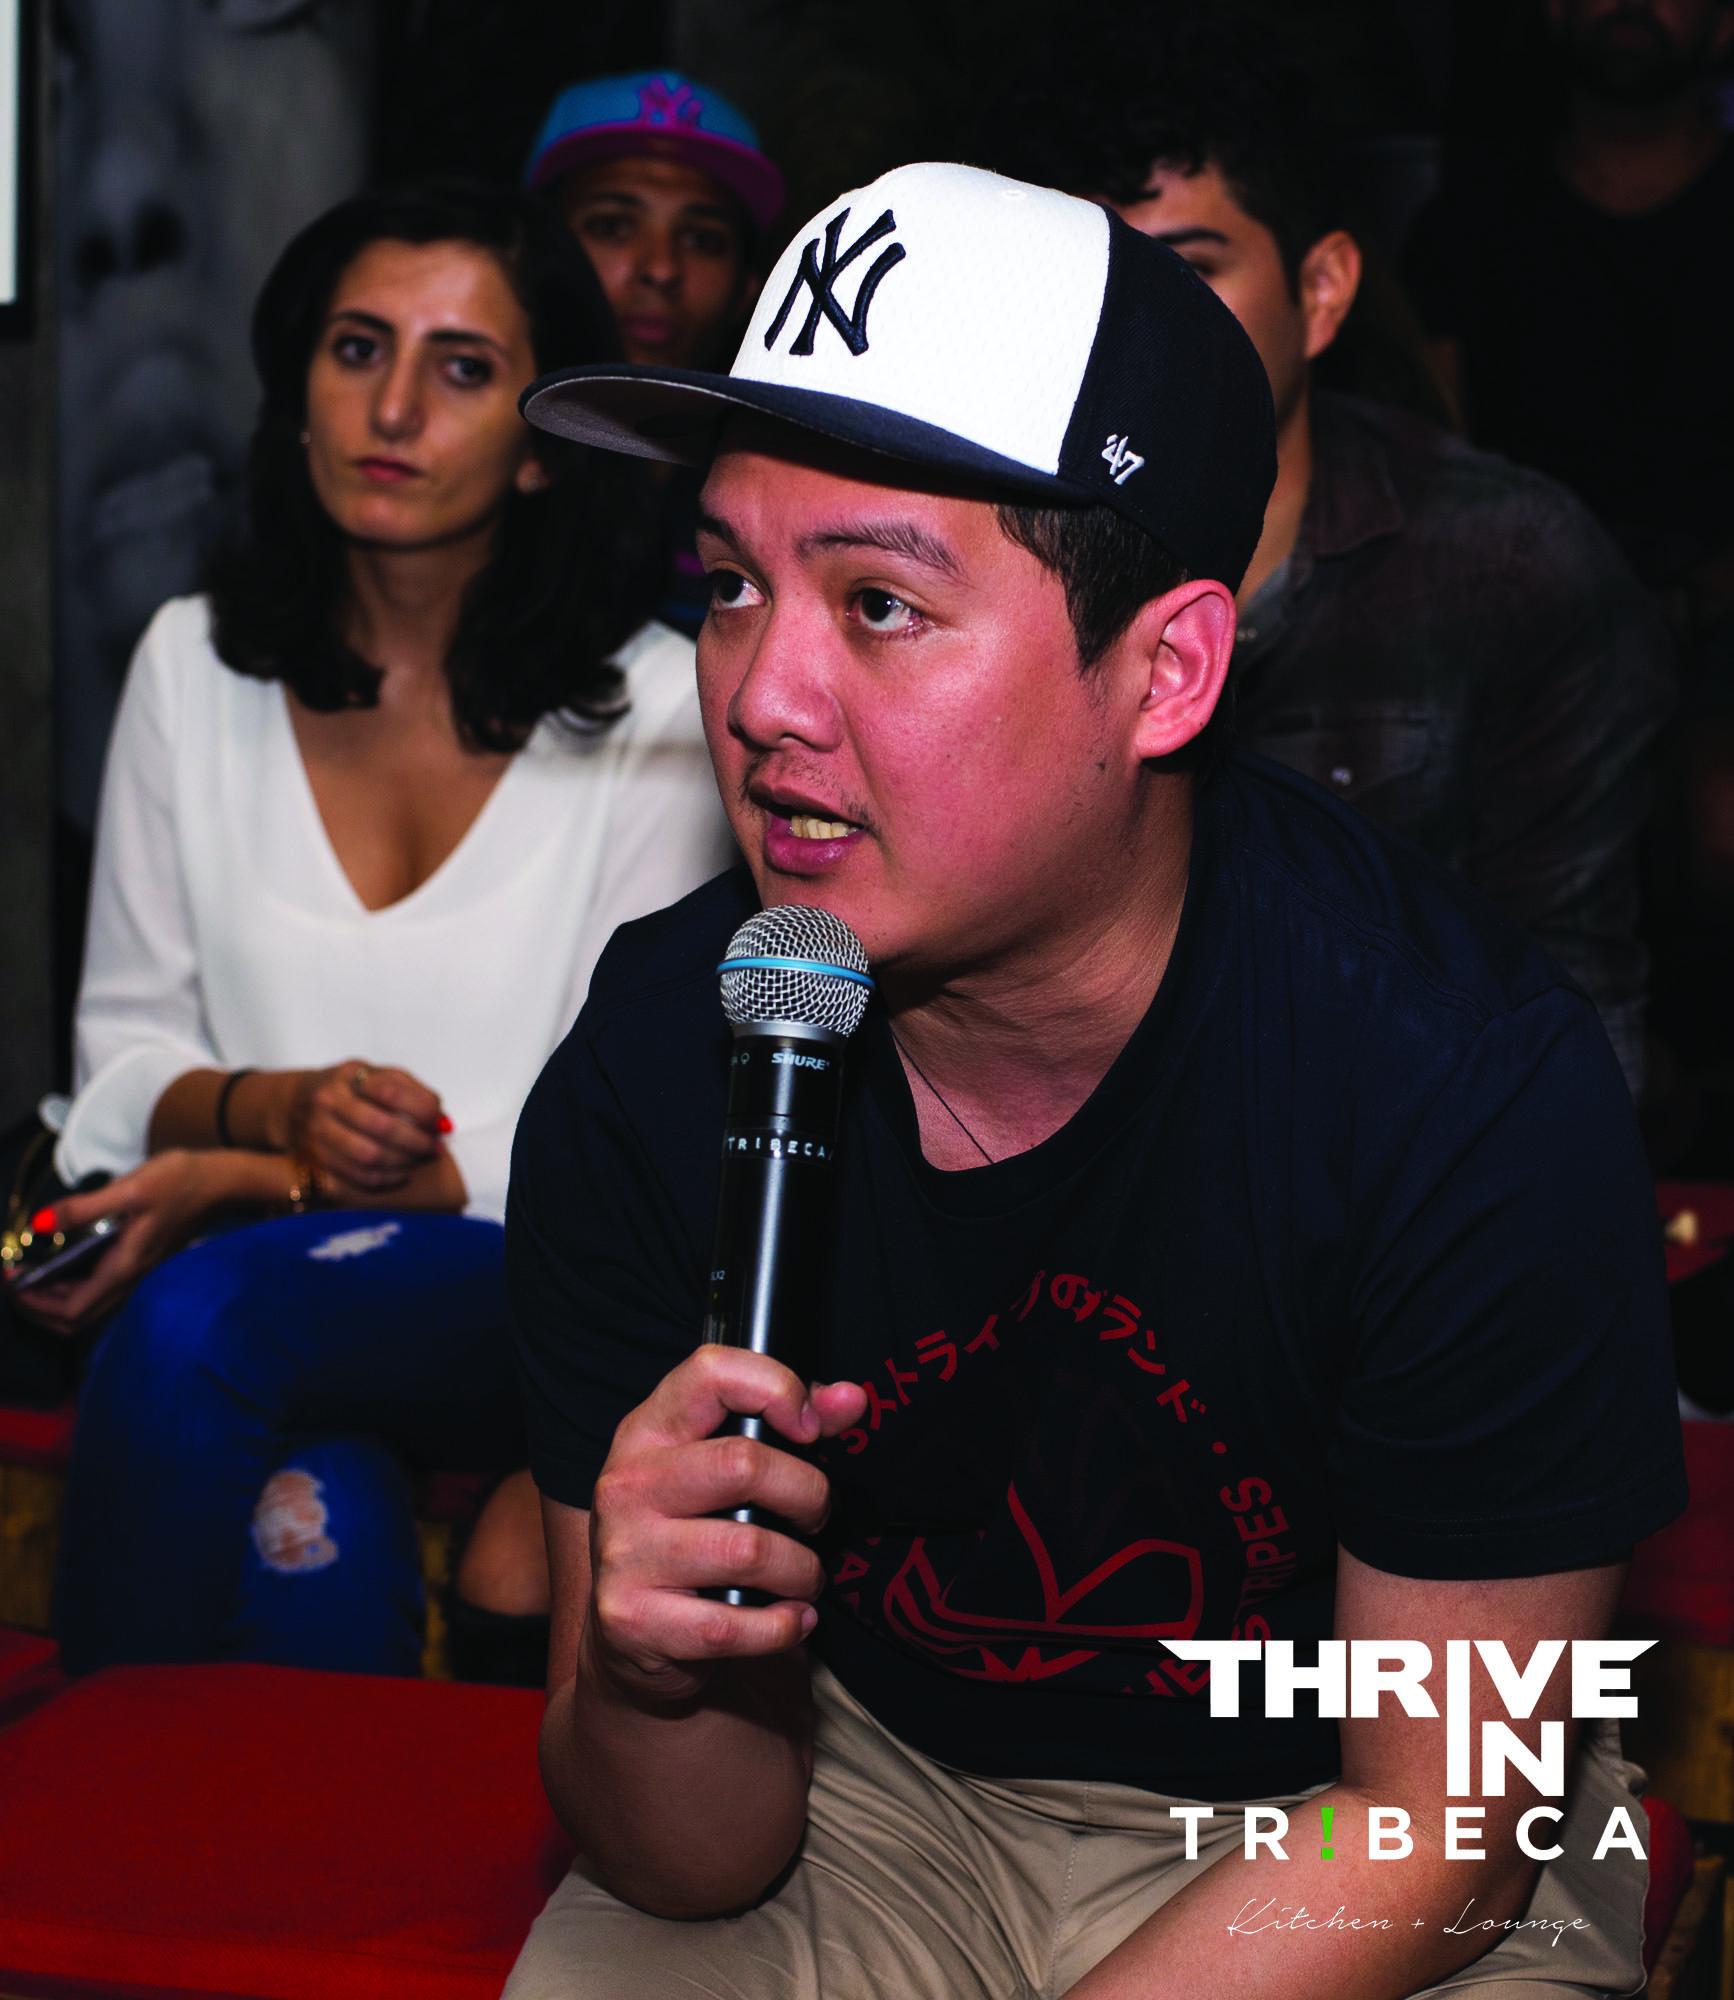 Thrive 31st pics 33.jpg